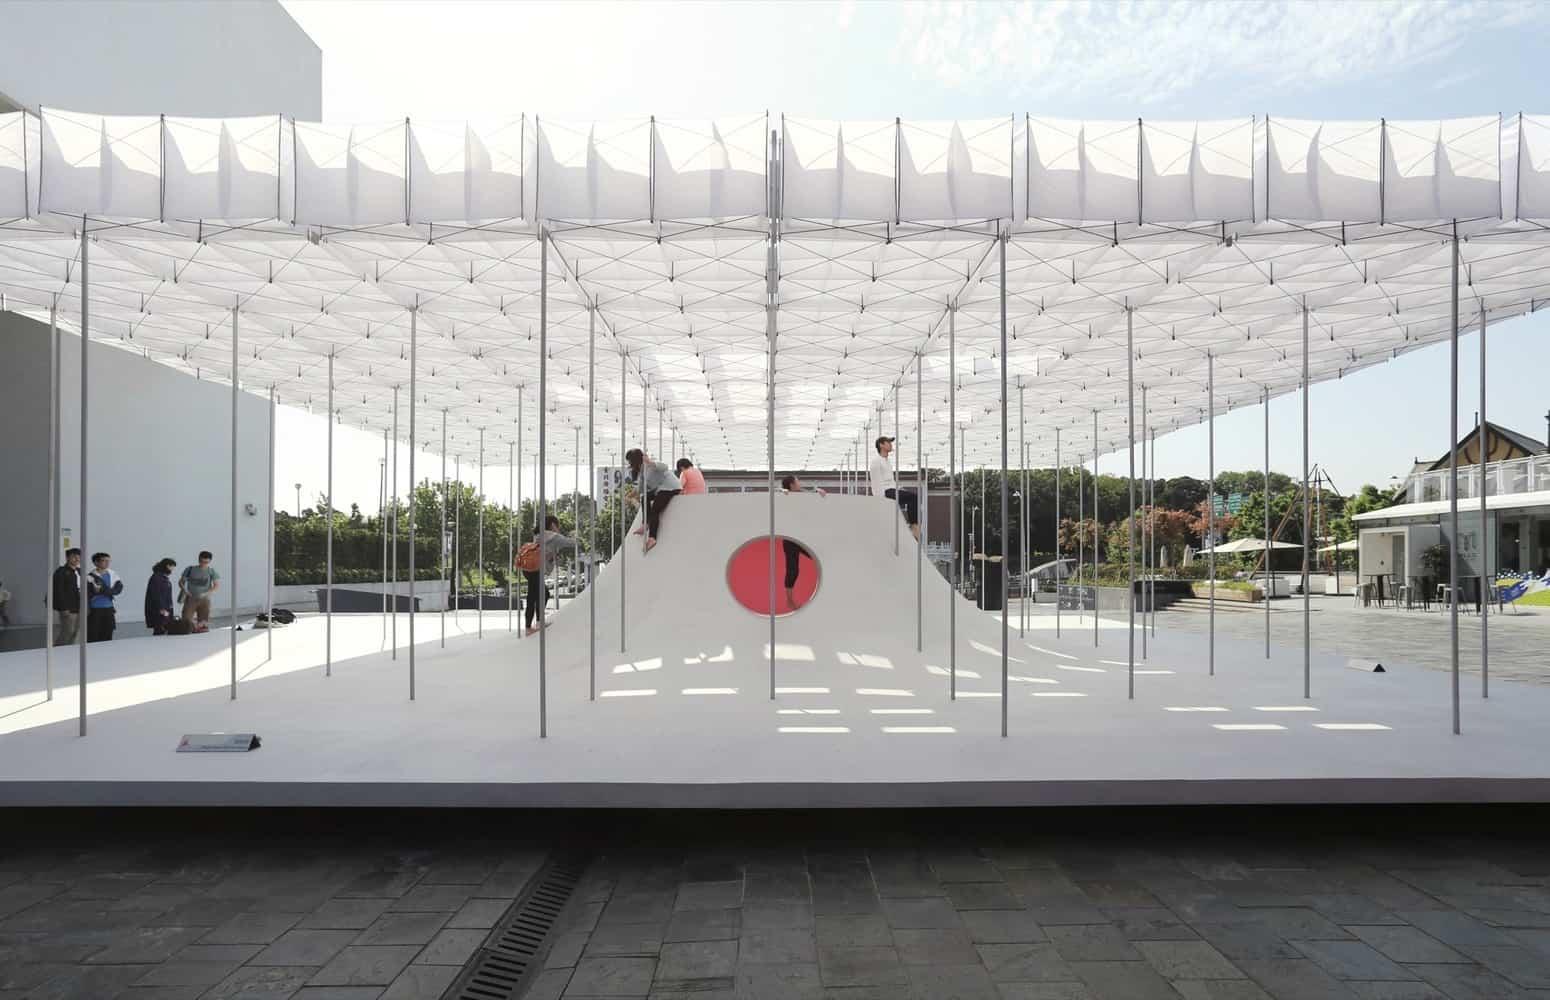 Pavilhão Flutuante / Shen Ting Tseng architects